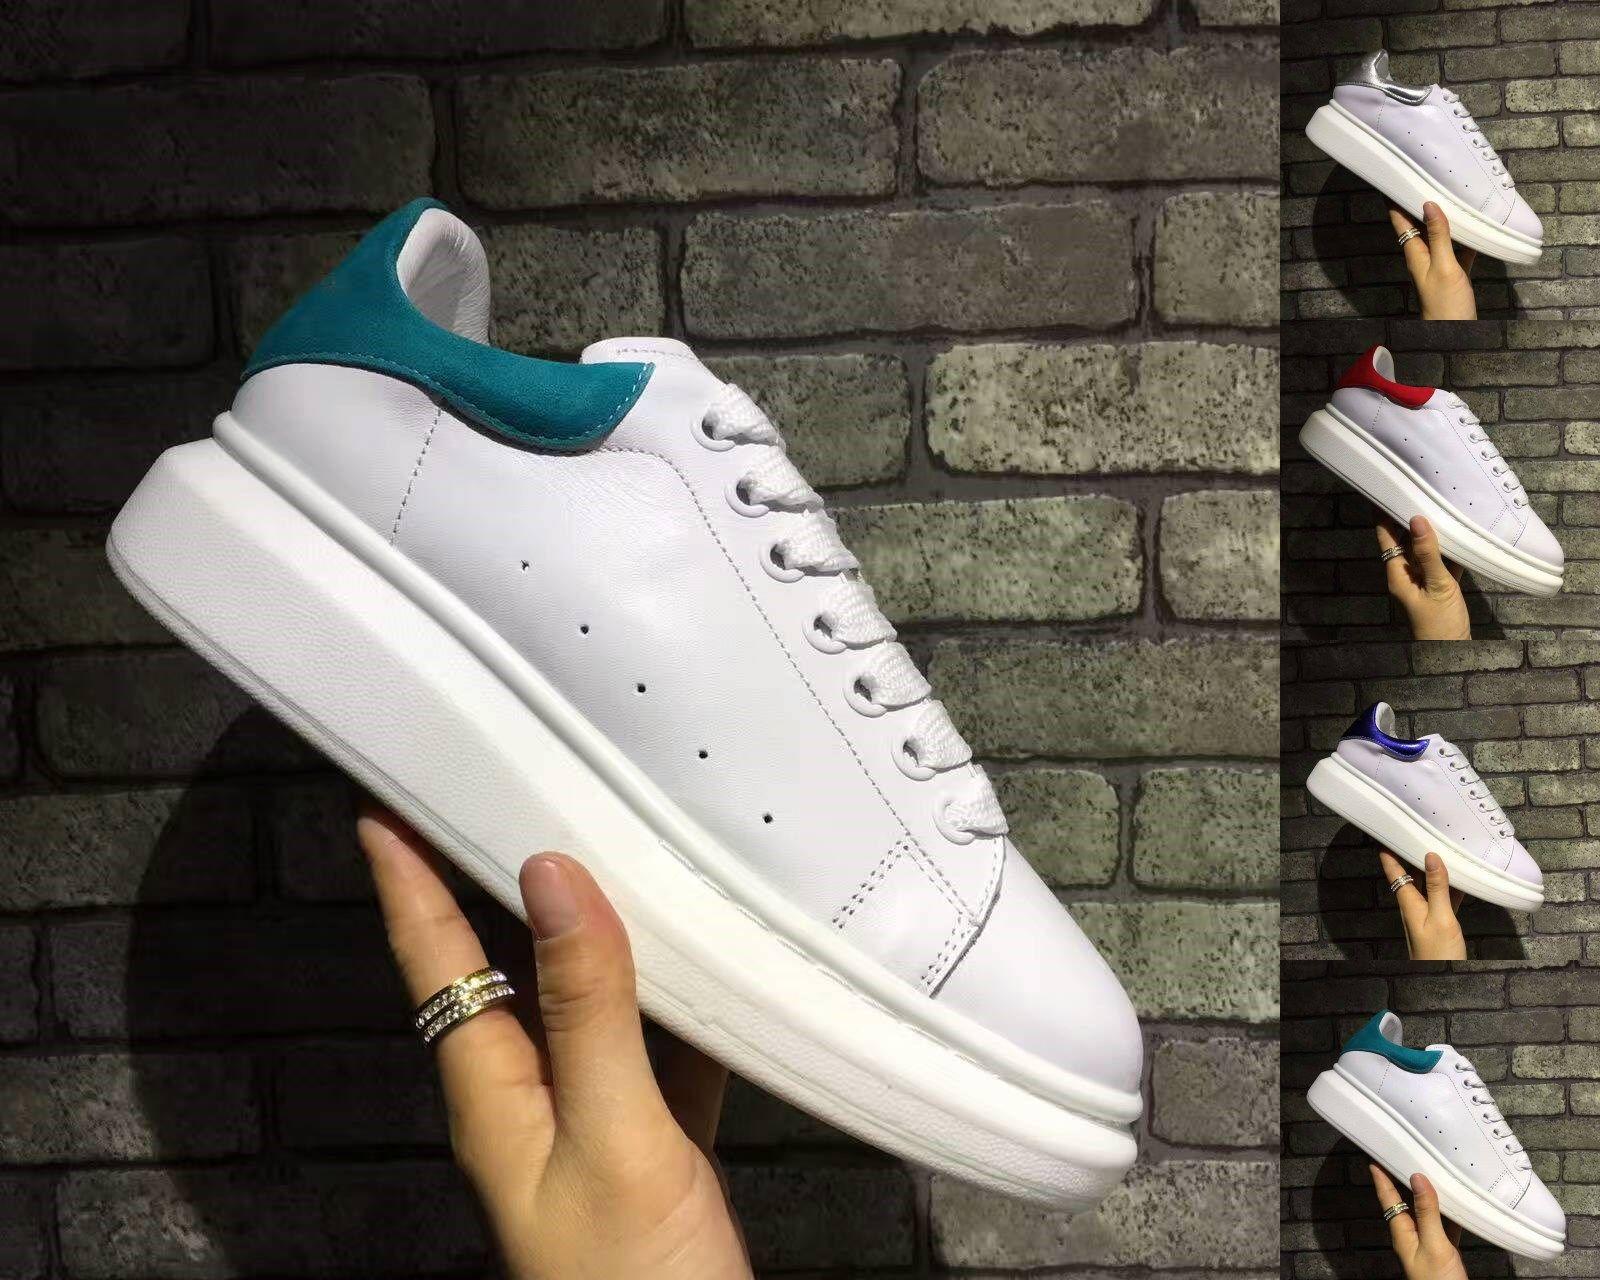 e7b8c79b354 Designer Casual Shoes Women Men Sneakers Sports Skateboarding Shoes Fashion  Racing Runner Luxury Brand Trendy Platform Walking Trainers Online with ...